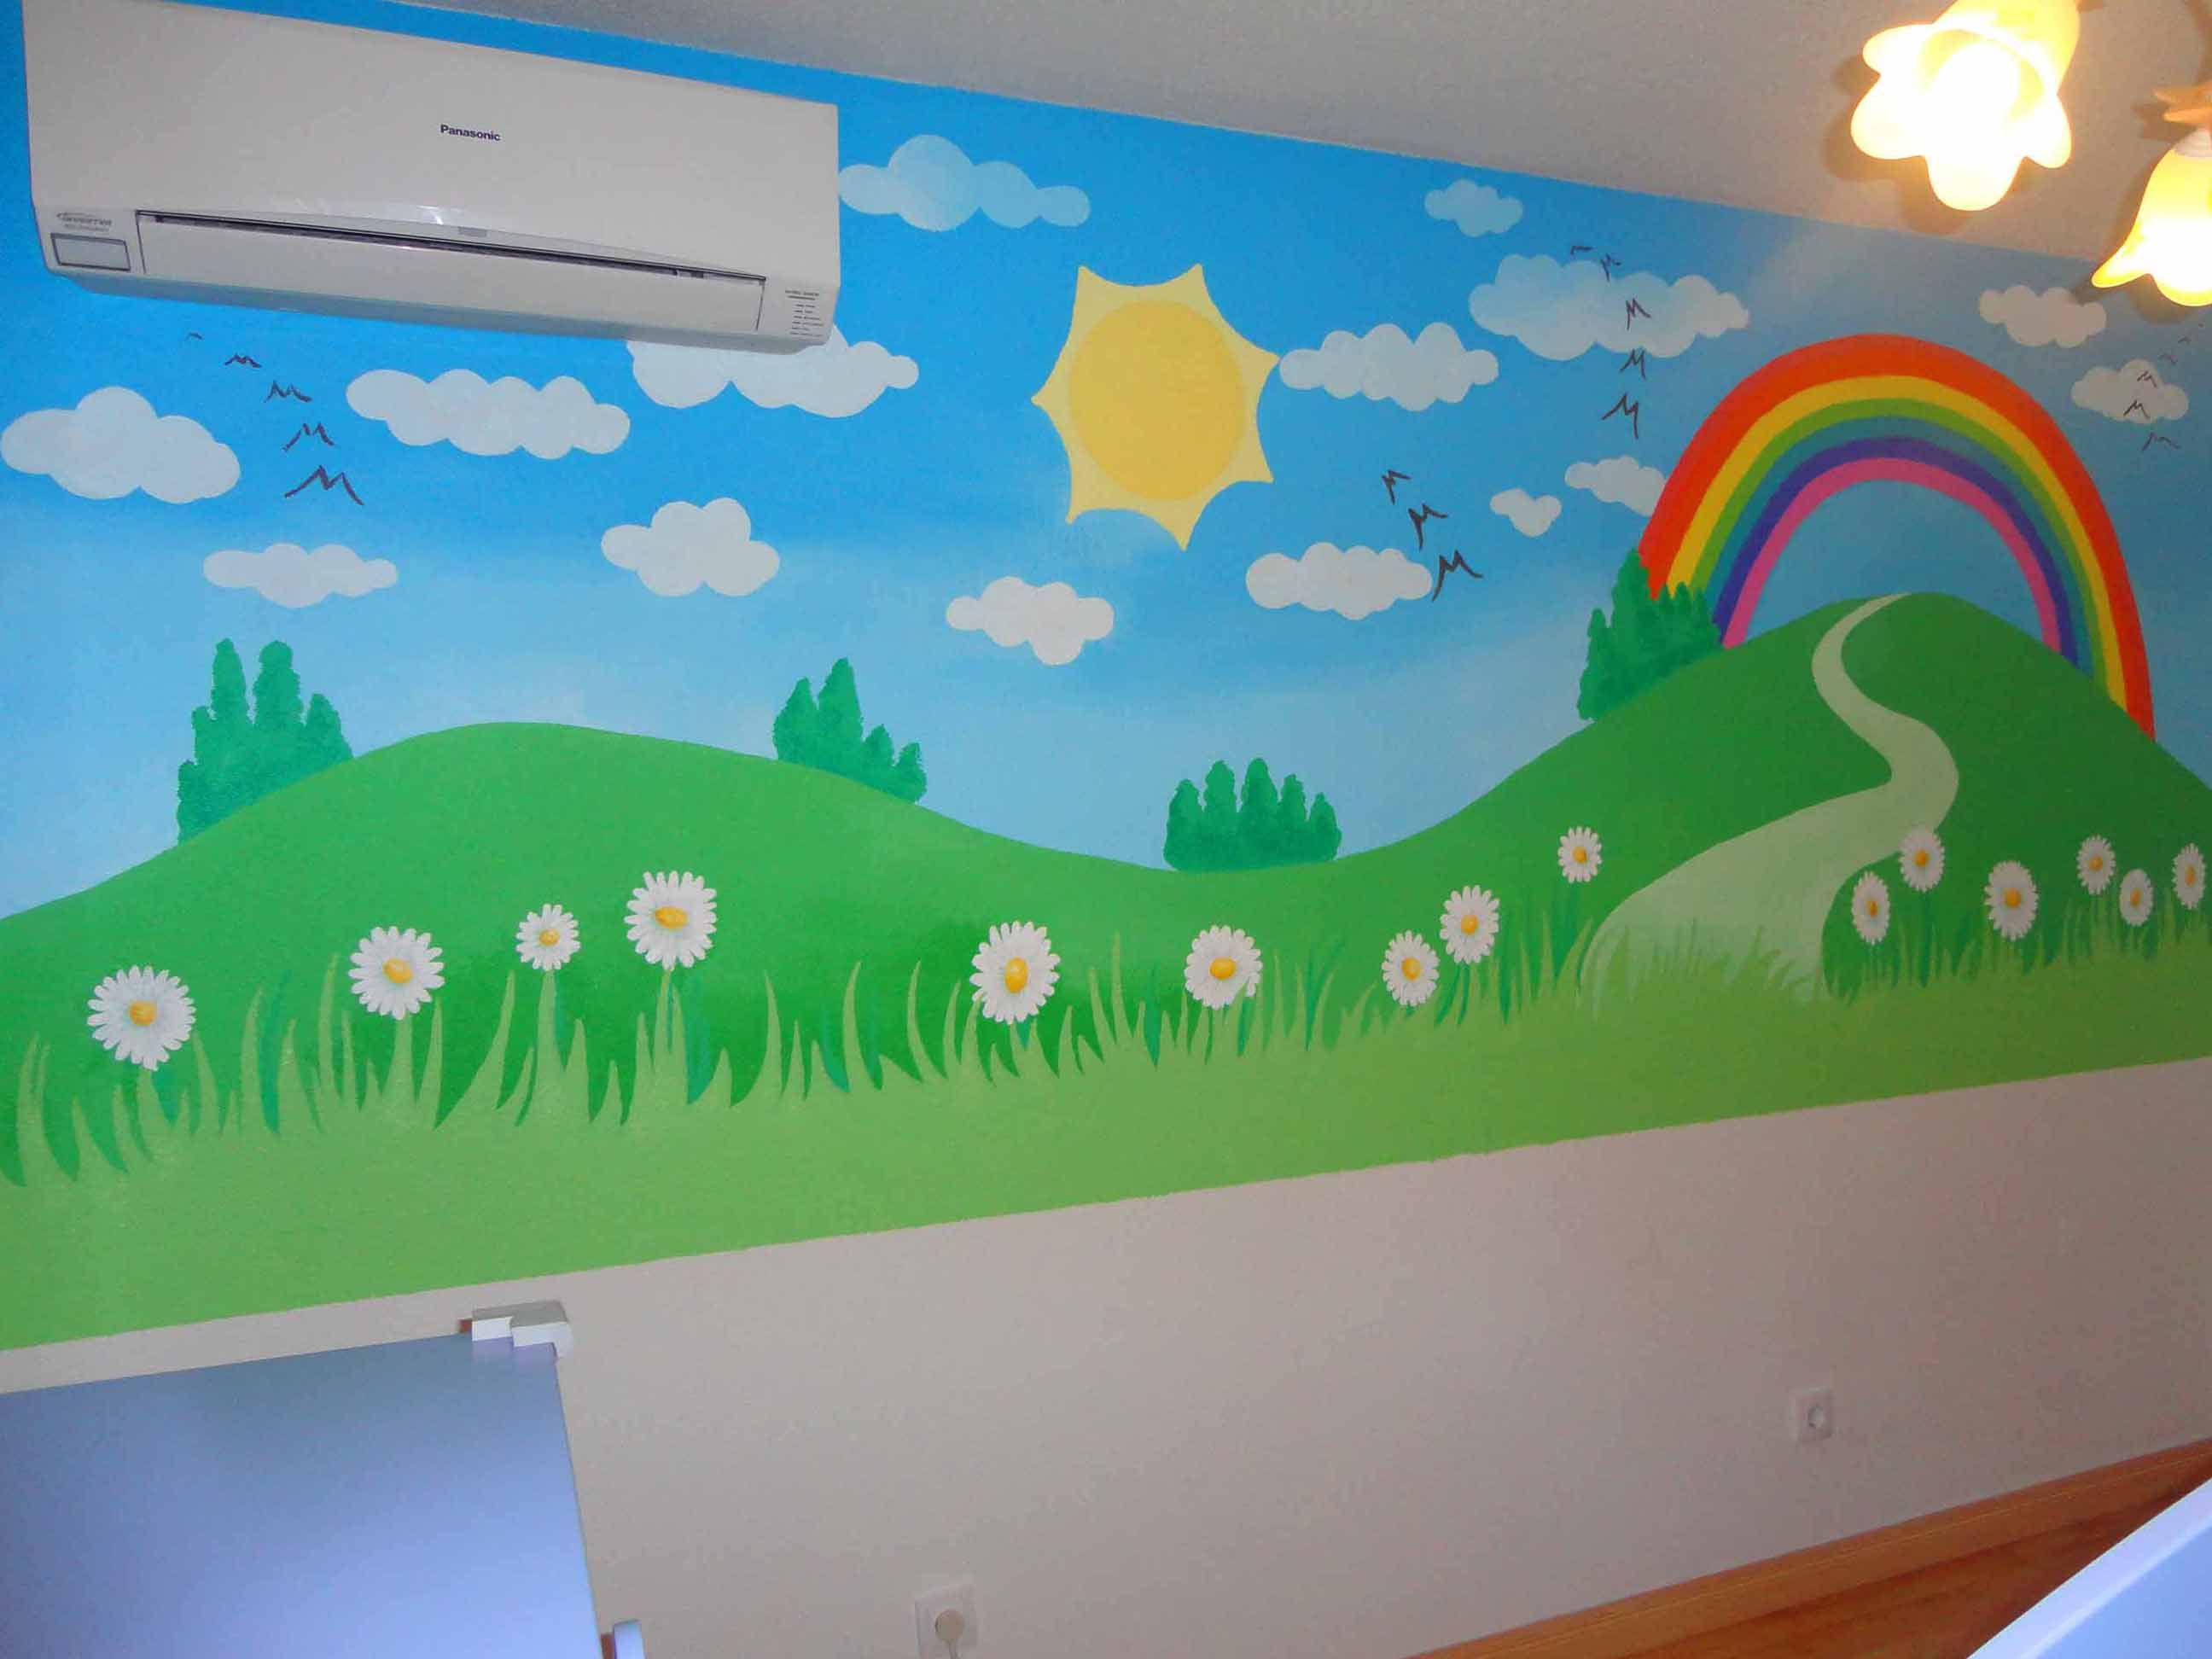 Murales Infantiles Arboles Buscar Con Google Casita Murales